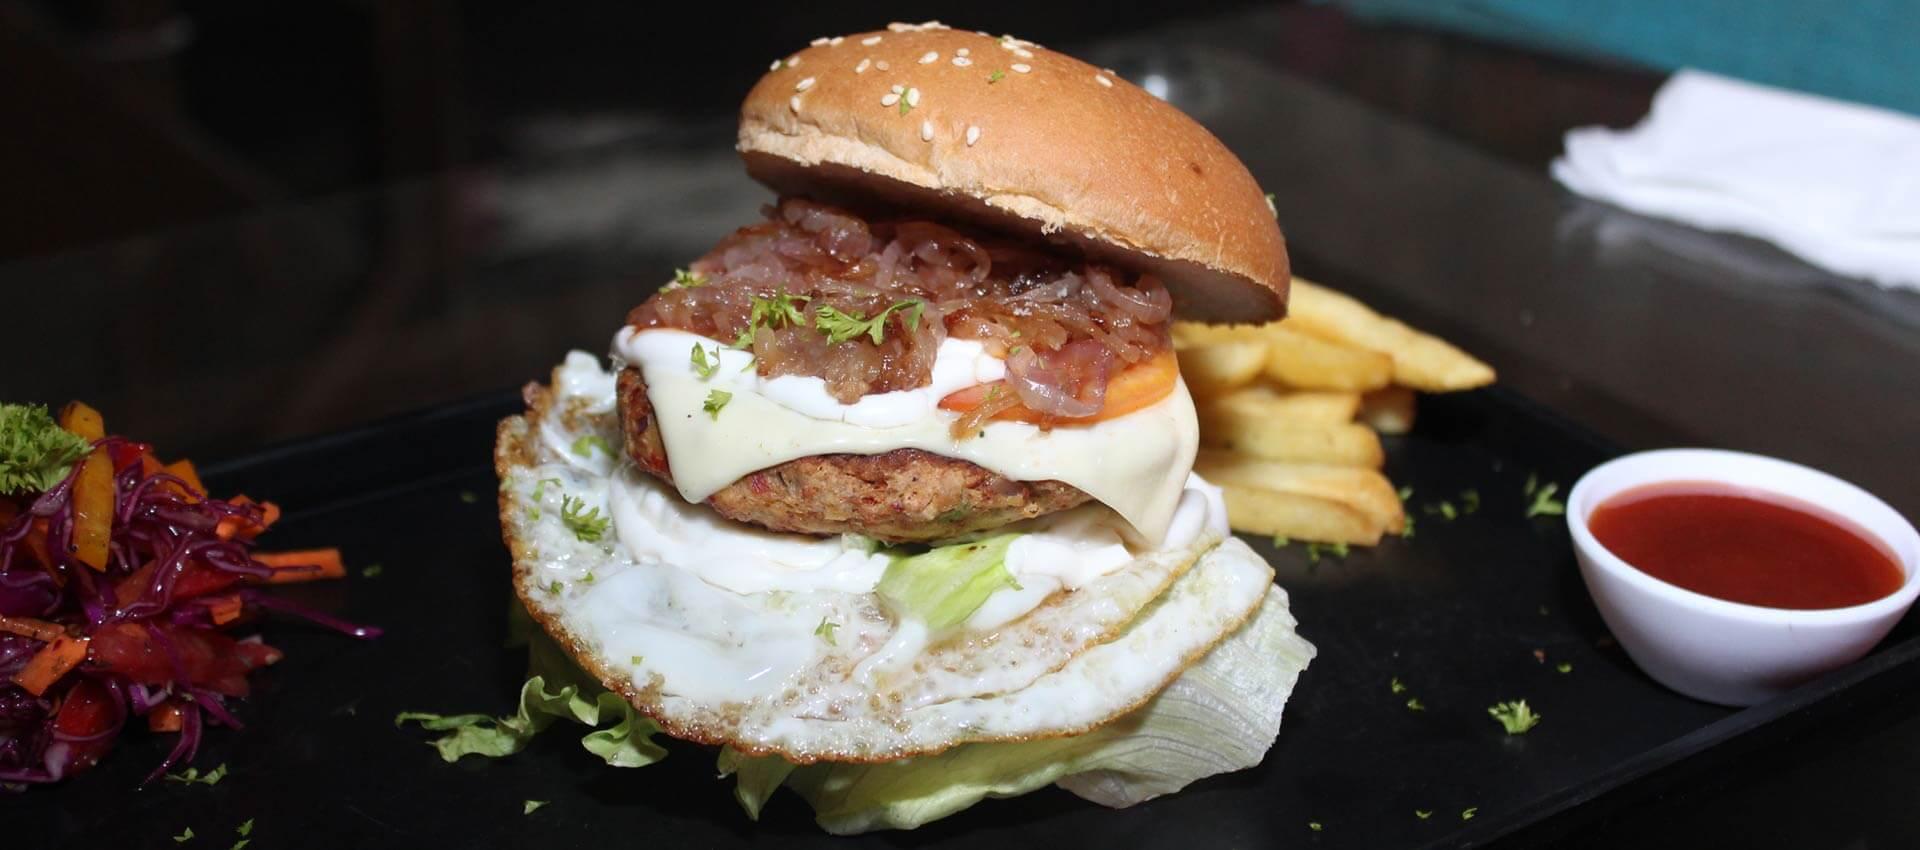 Chicken cheese Burger at HugsandMugs